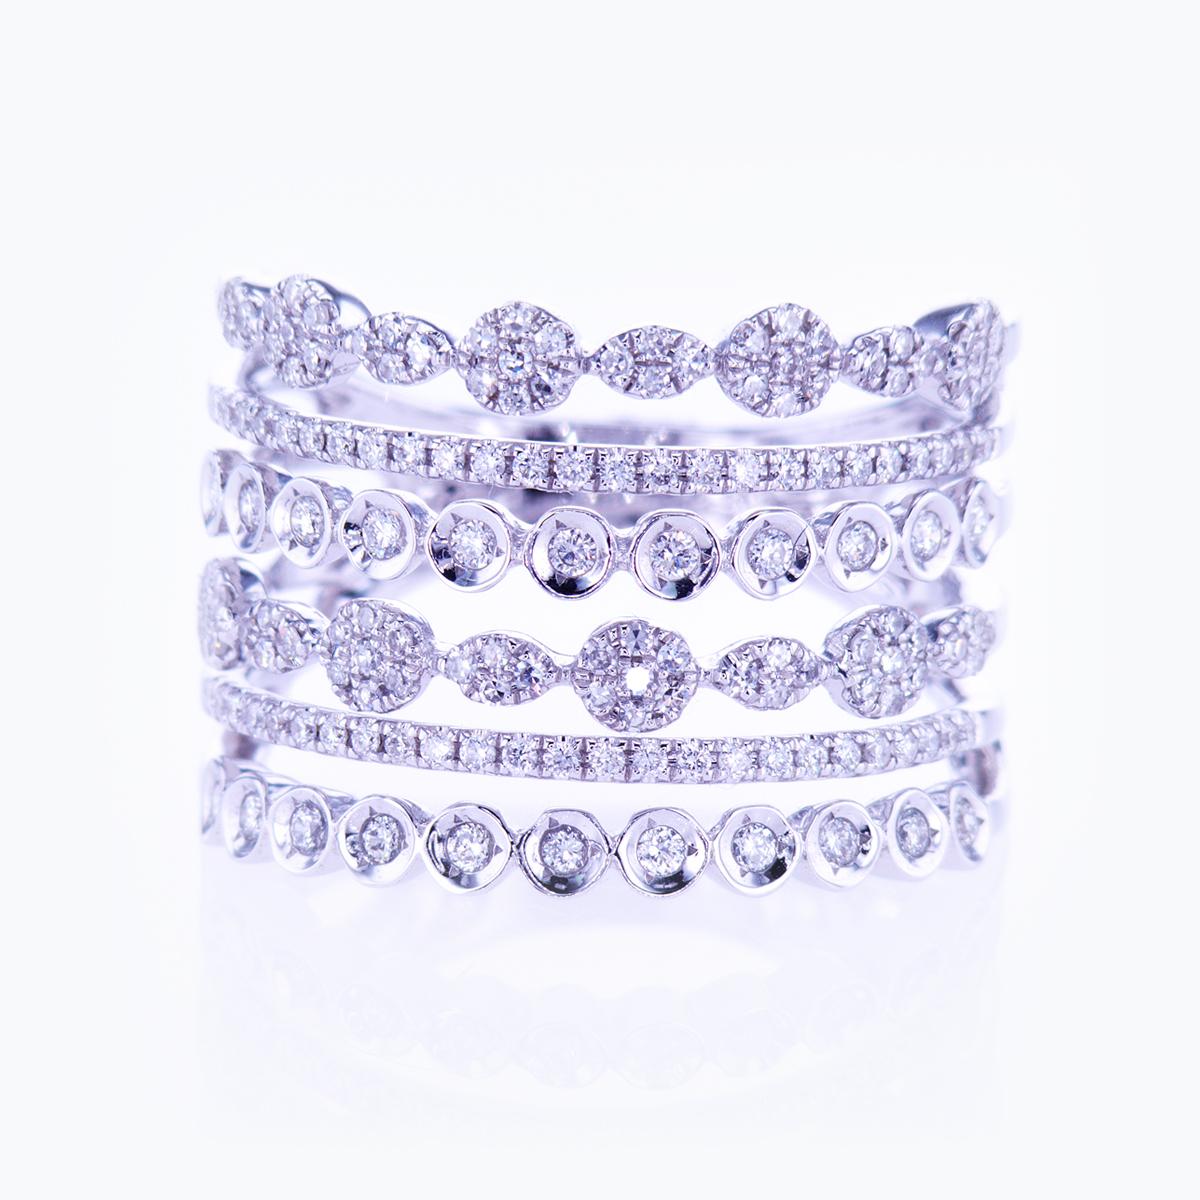 Multi-band Dimond Fashion Ring